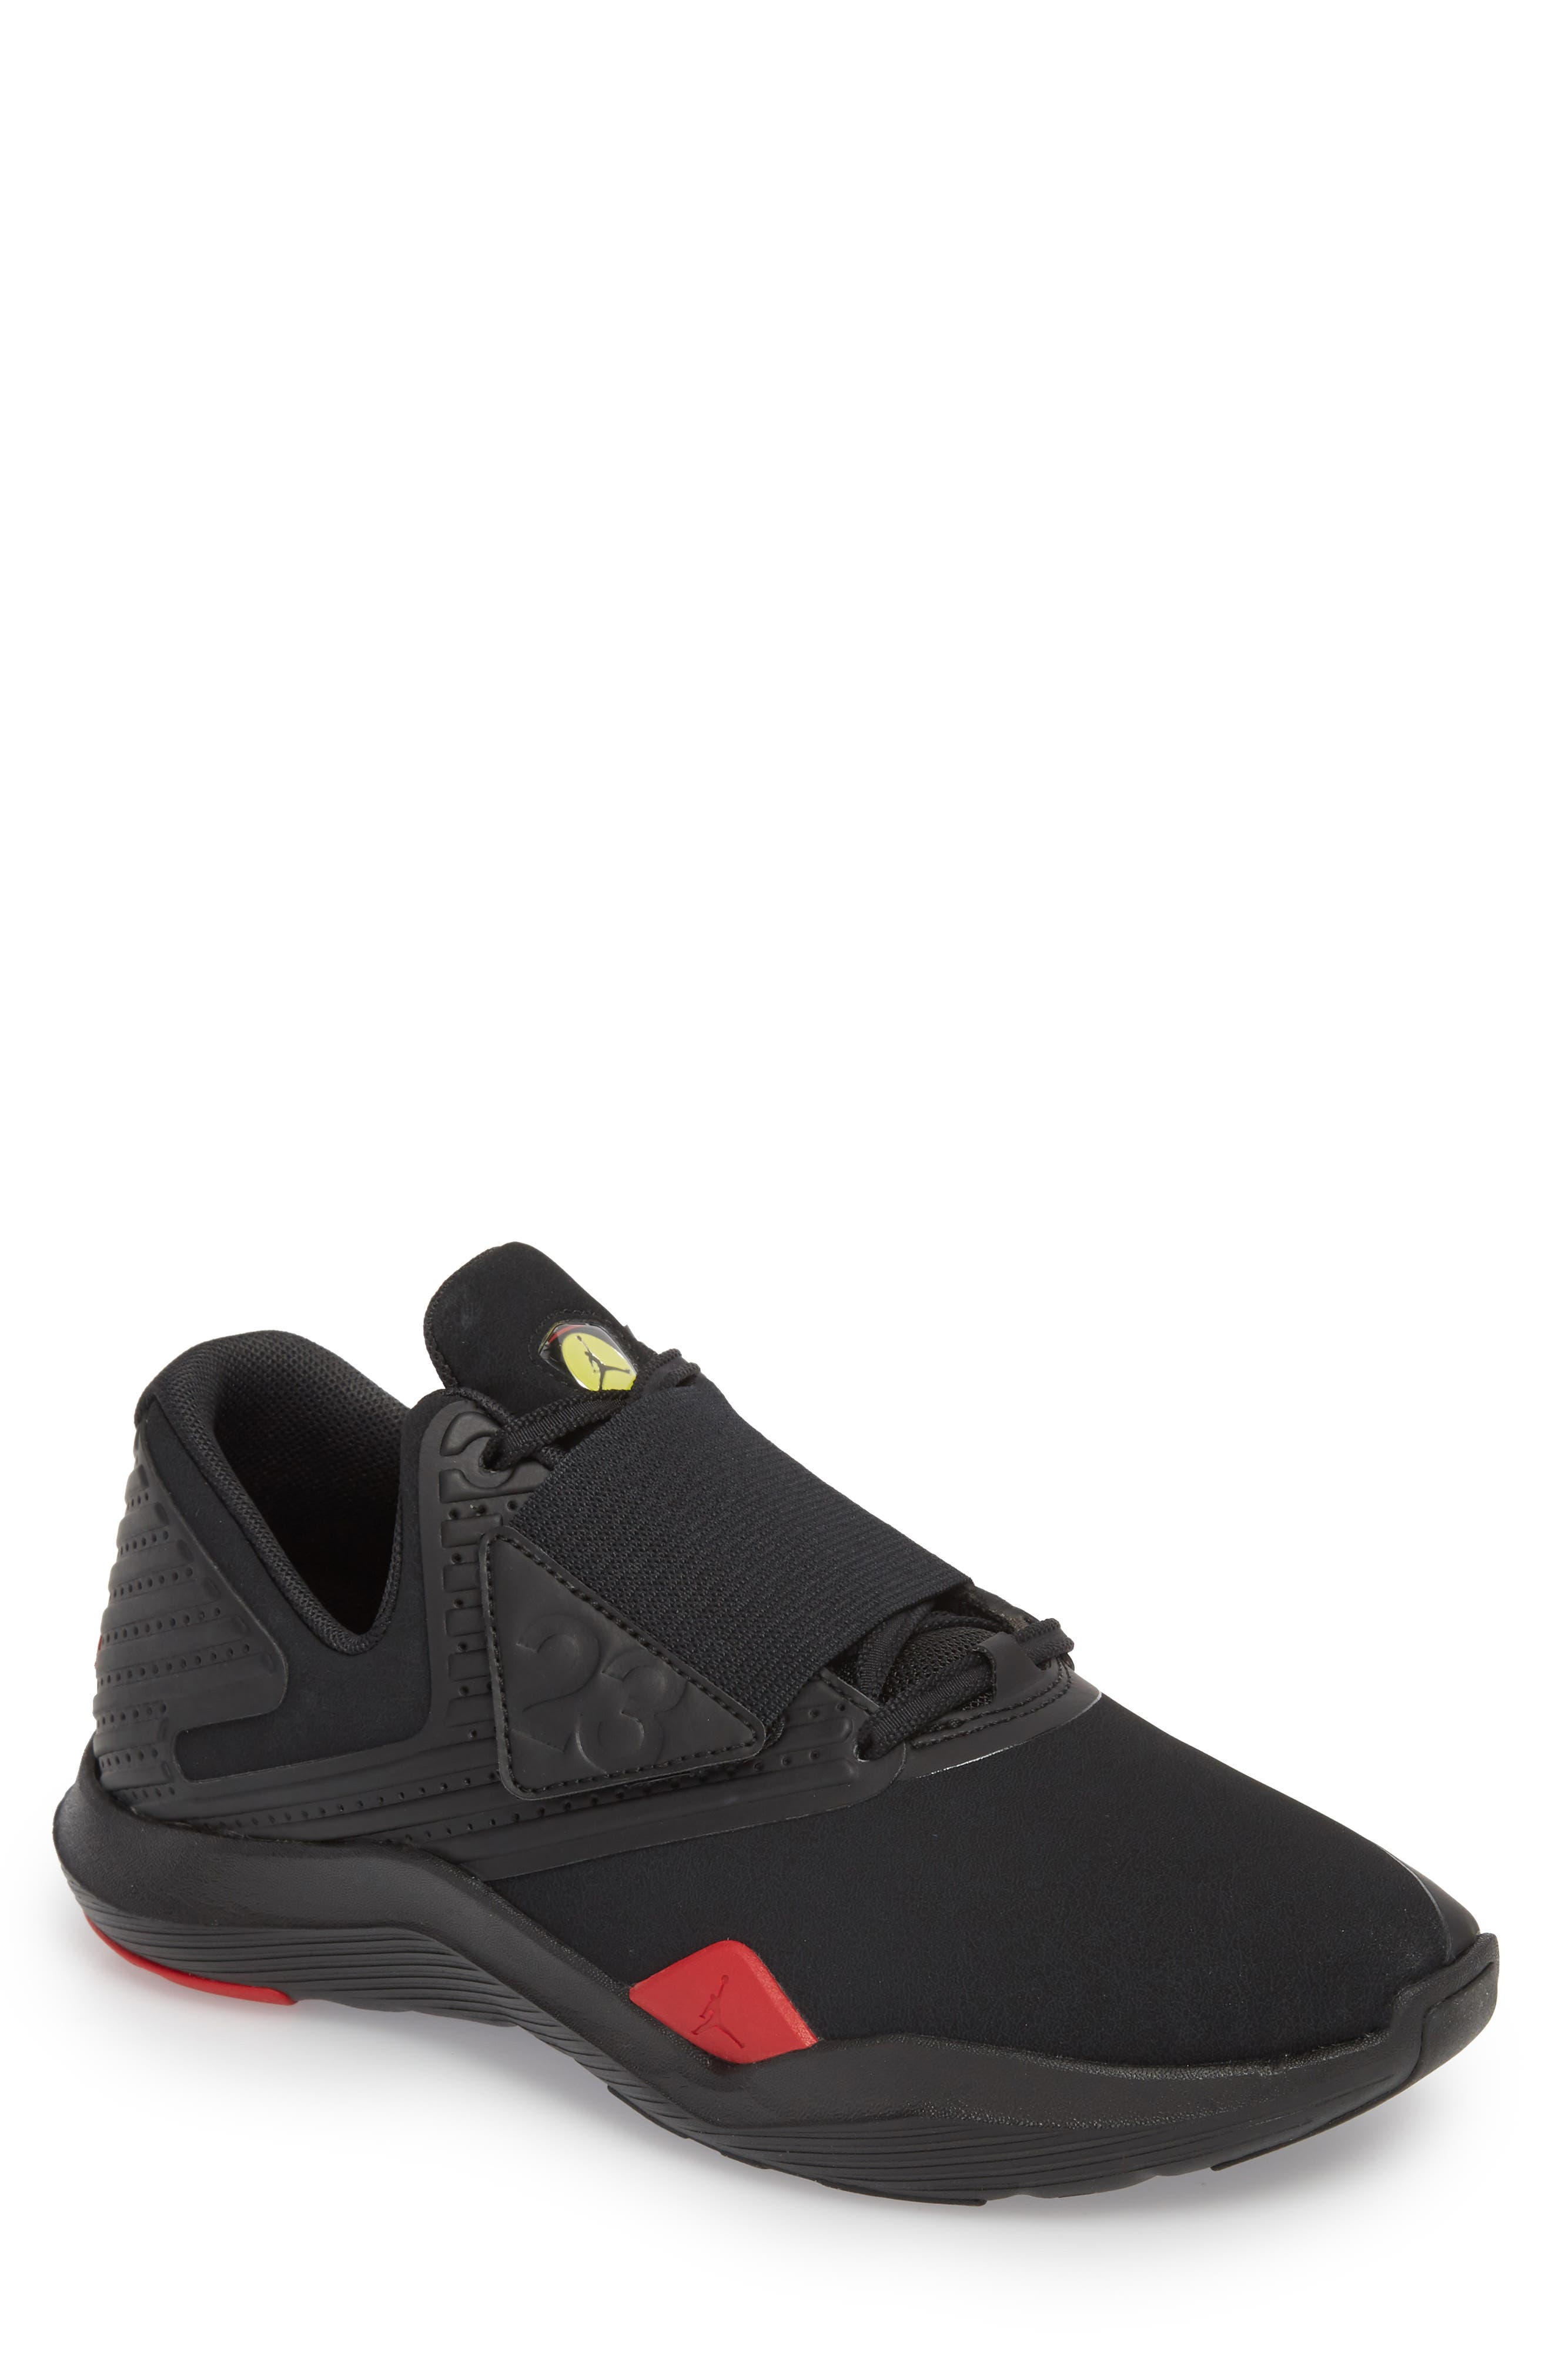 Air Jordan Relentless Training Sneaker,                         Main,                         color, Black/ Varsity Red/ Dandelion